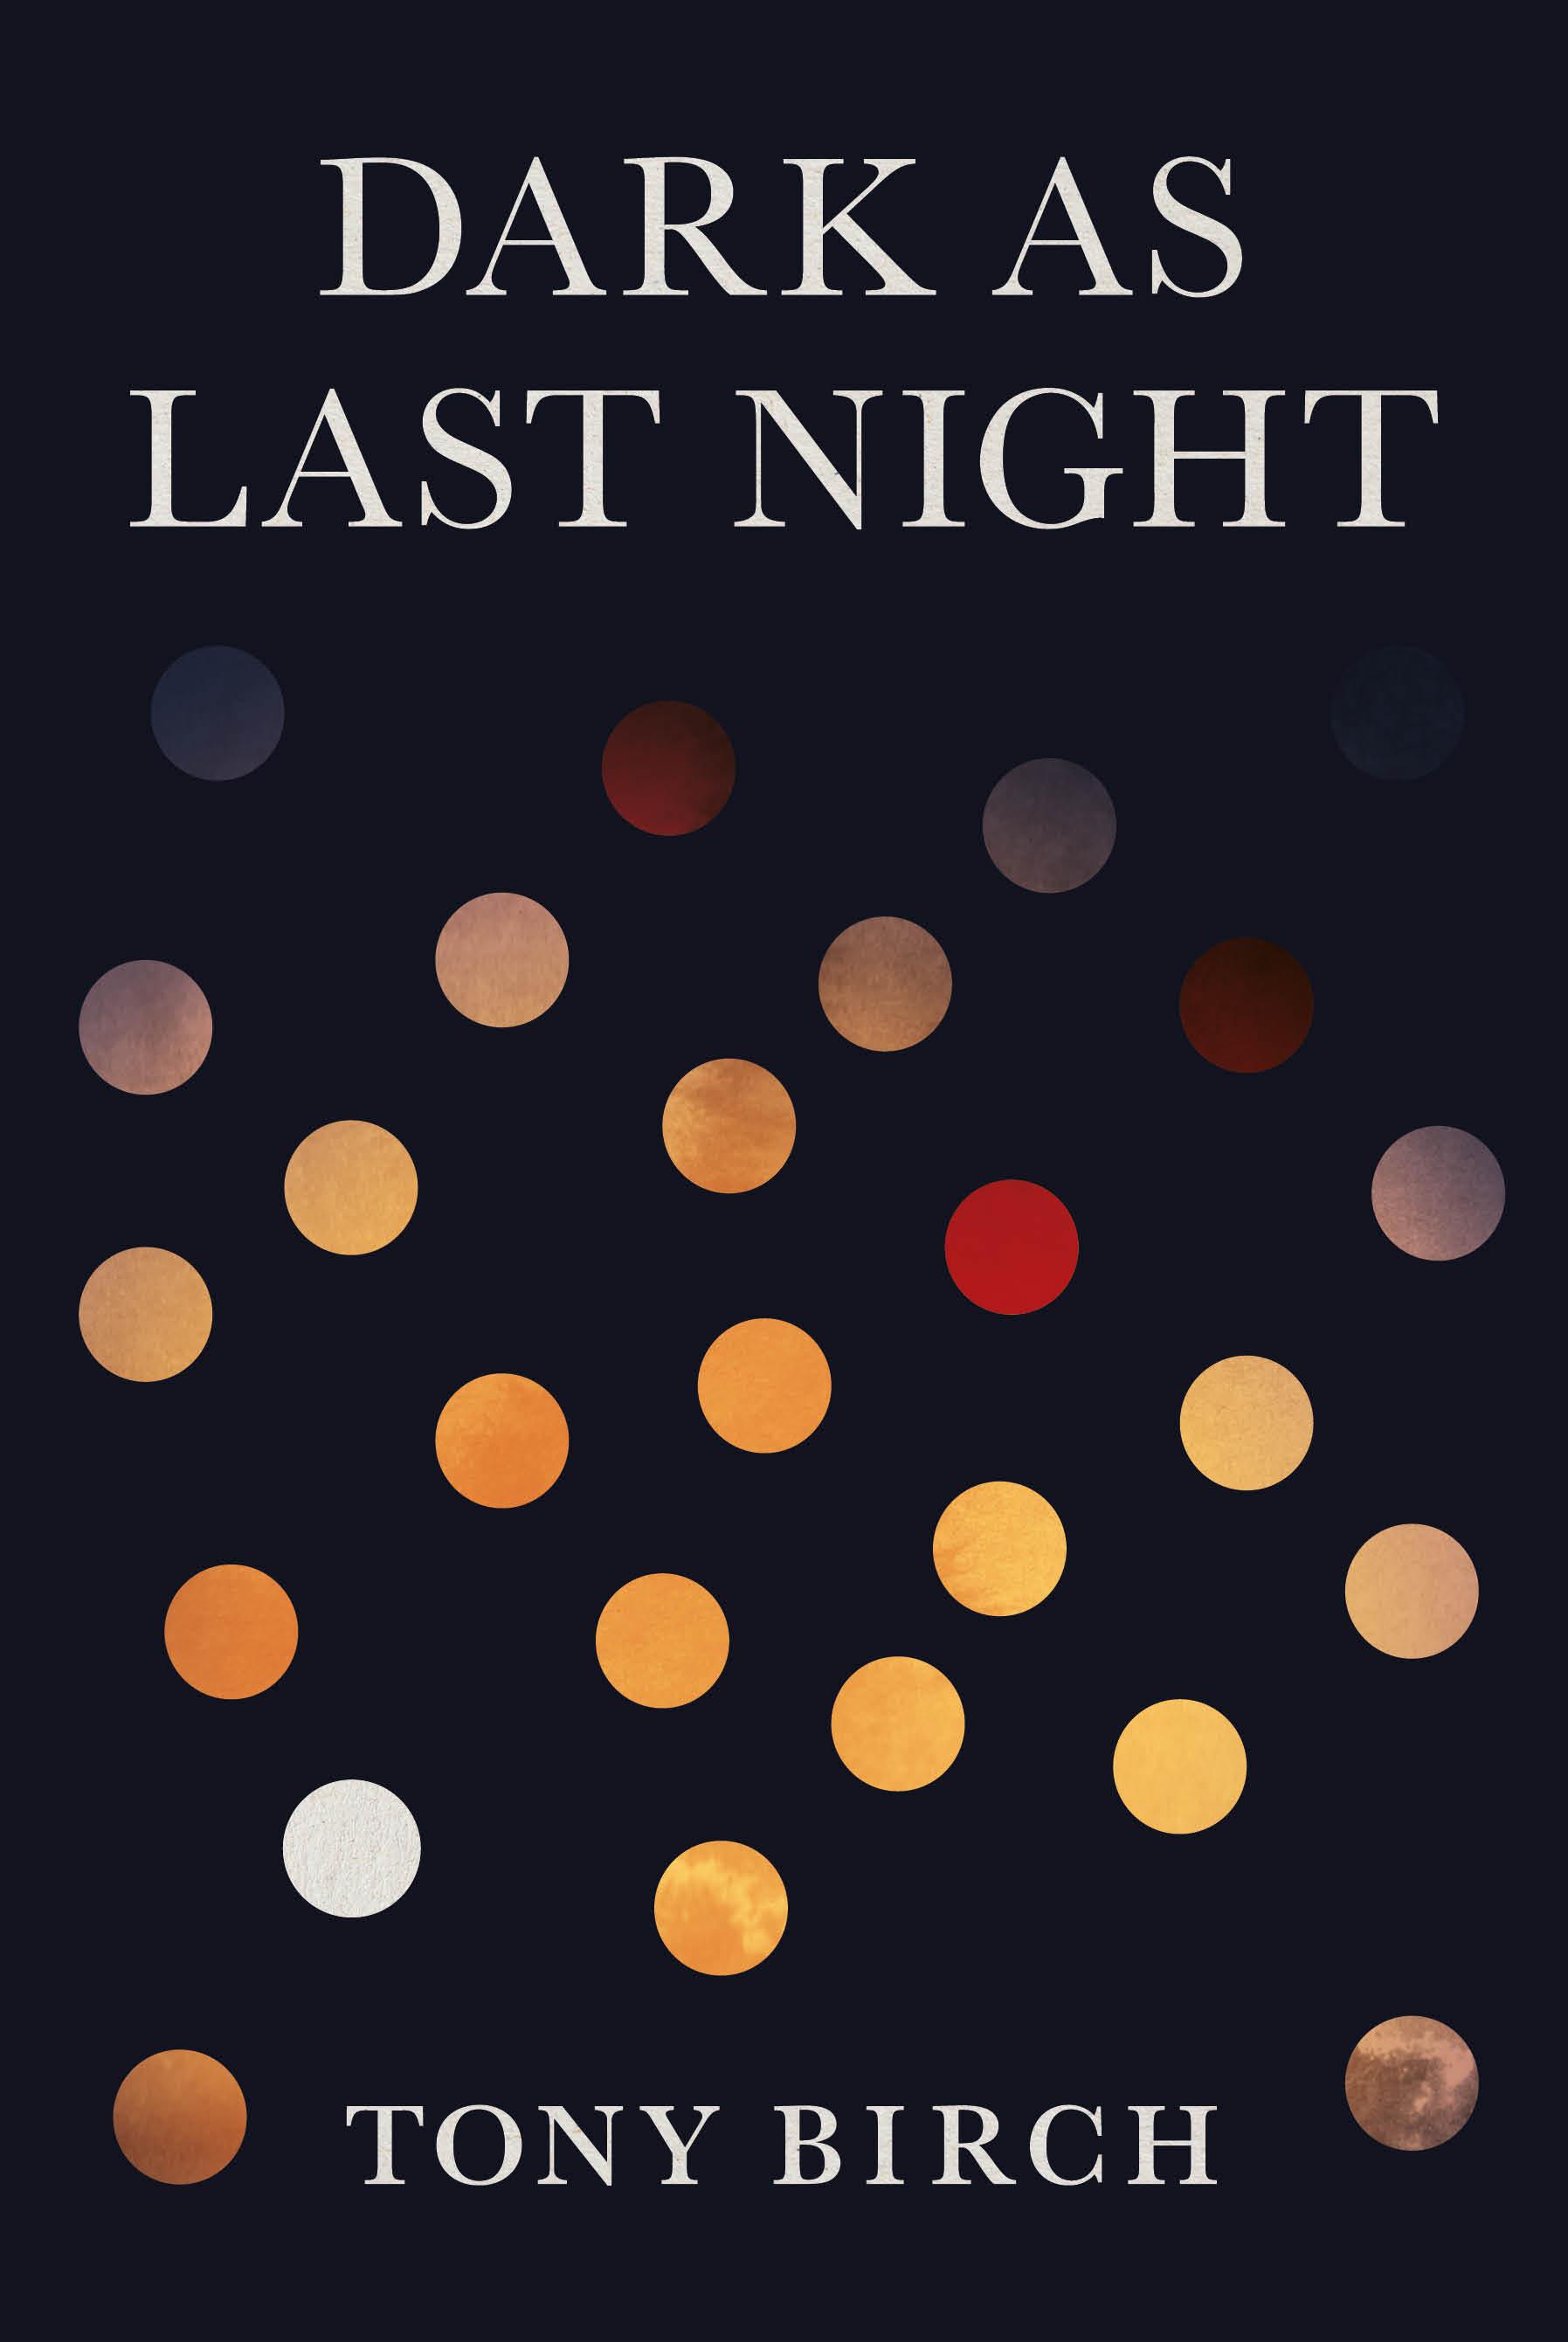 Dark as Last Night by Tony Birch